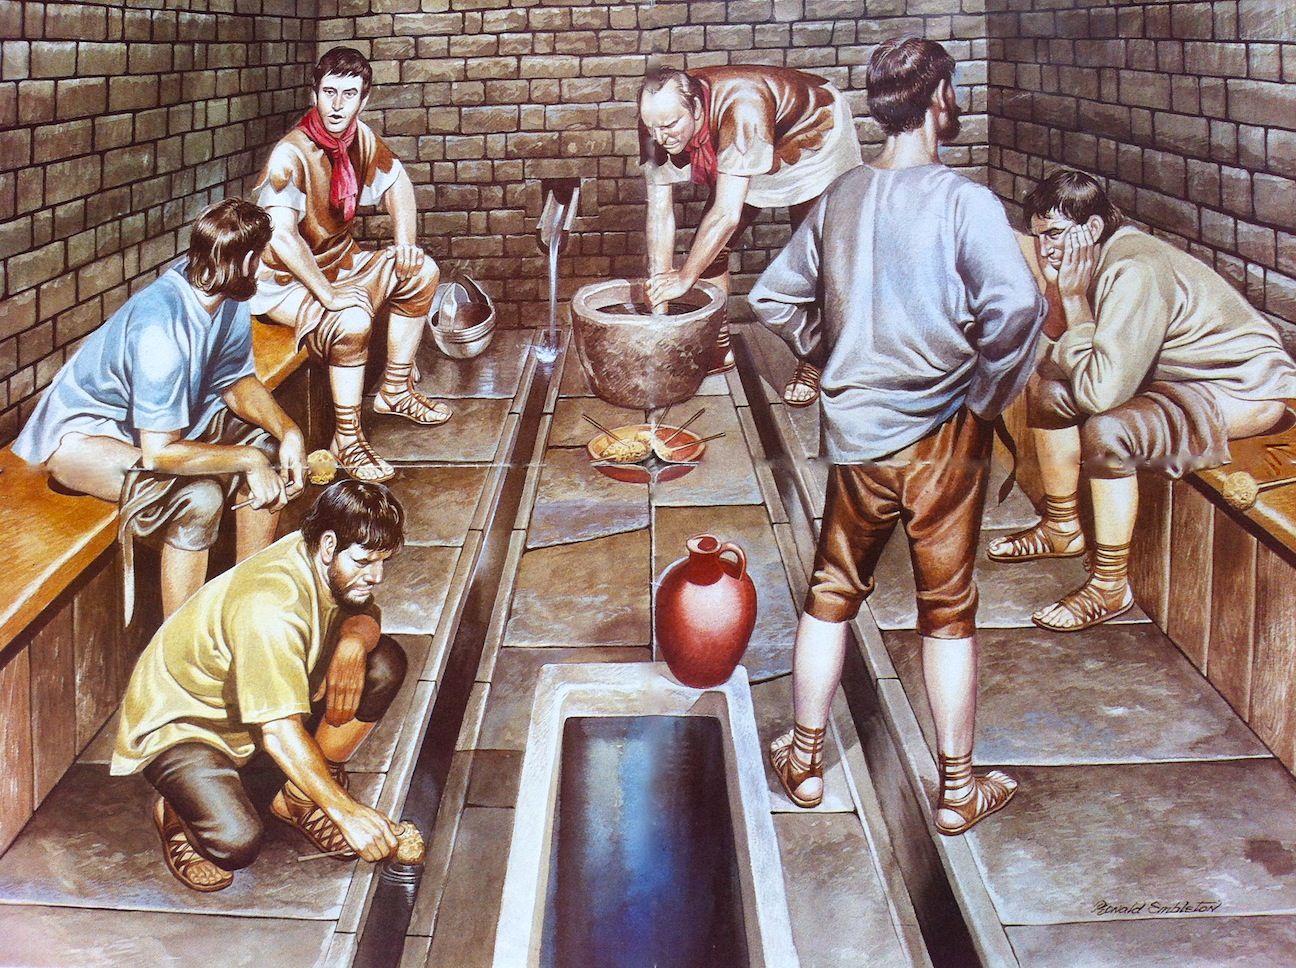 Toilet Sanitation in Ancient Rome